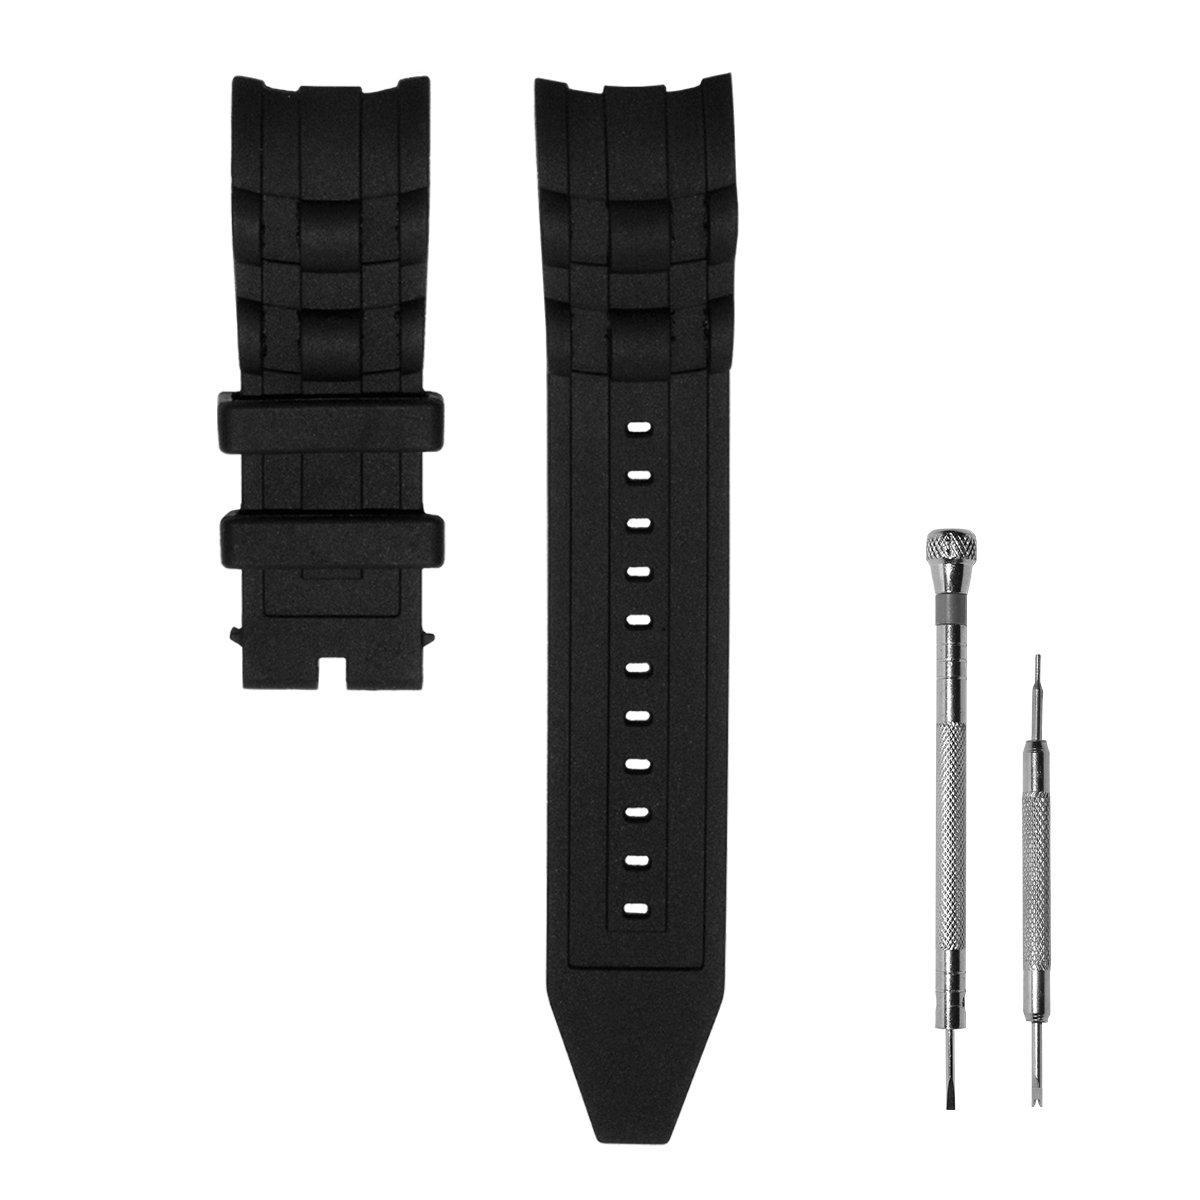 CACA for Invicta Pro Diver Watch Replacement Rubber Silicone Band/Strap - Black Invicta Watch Bands